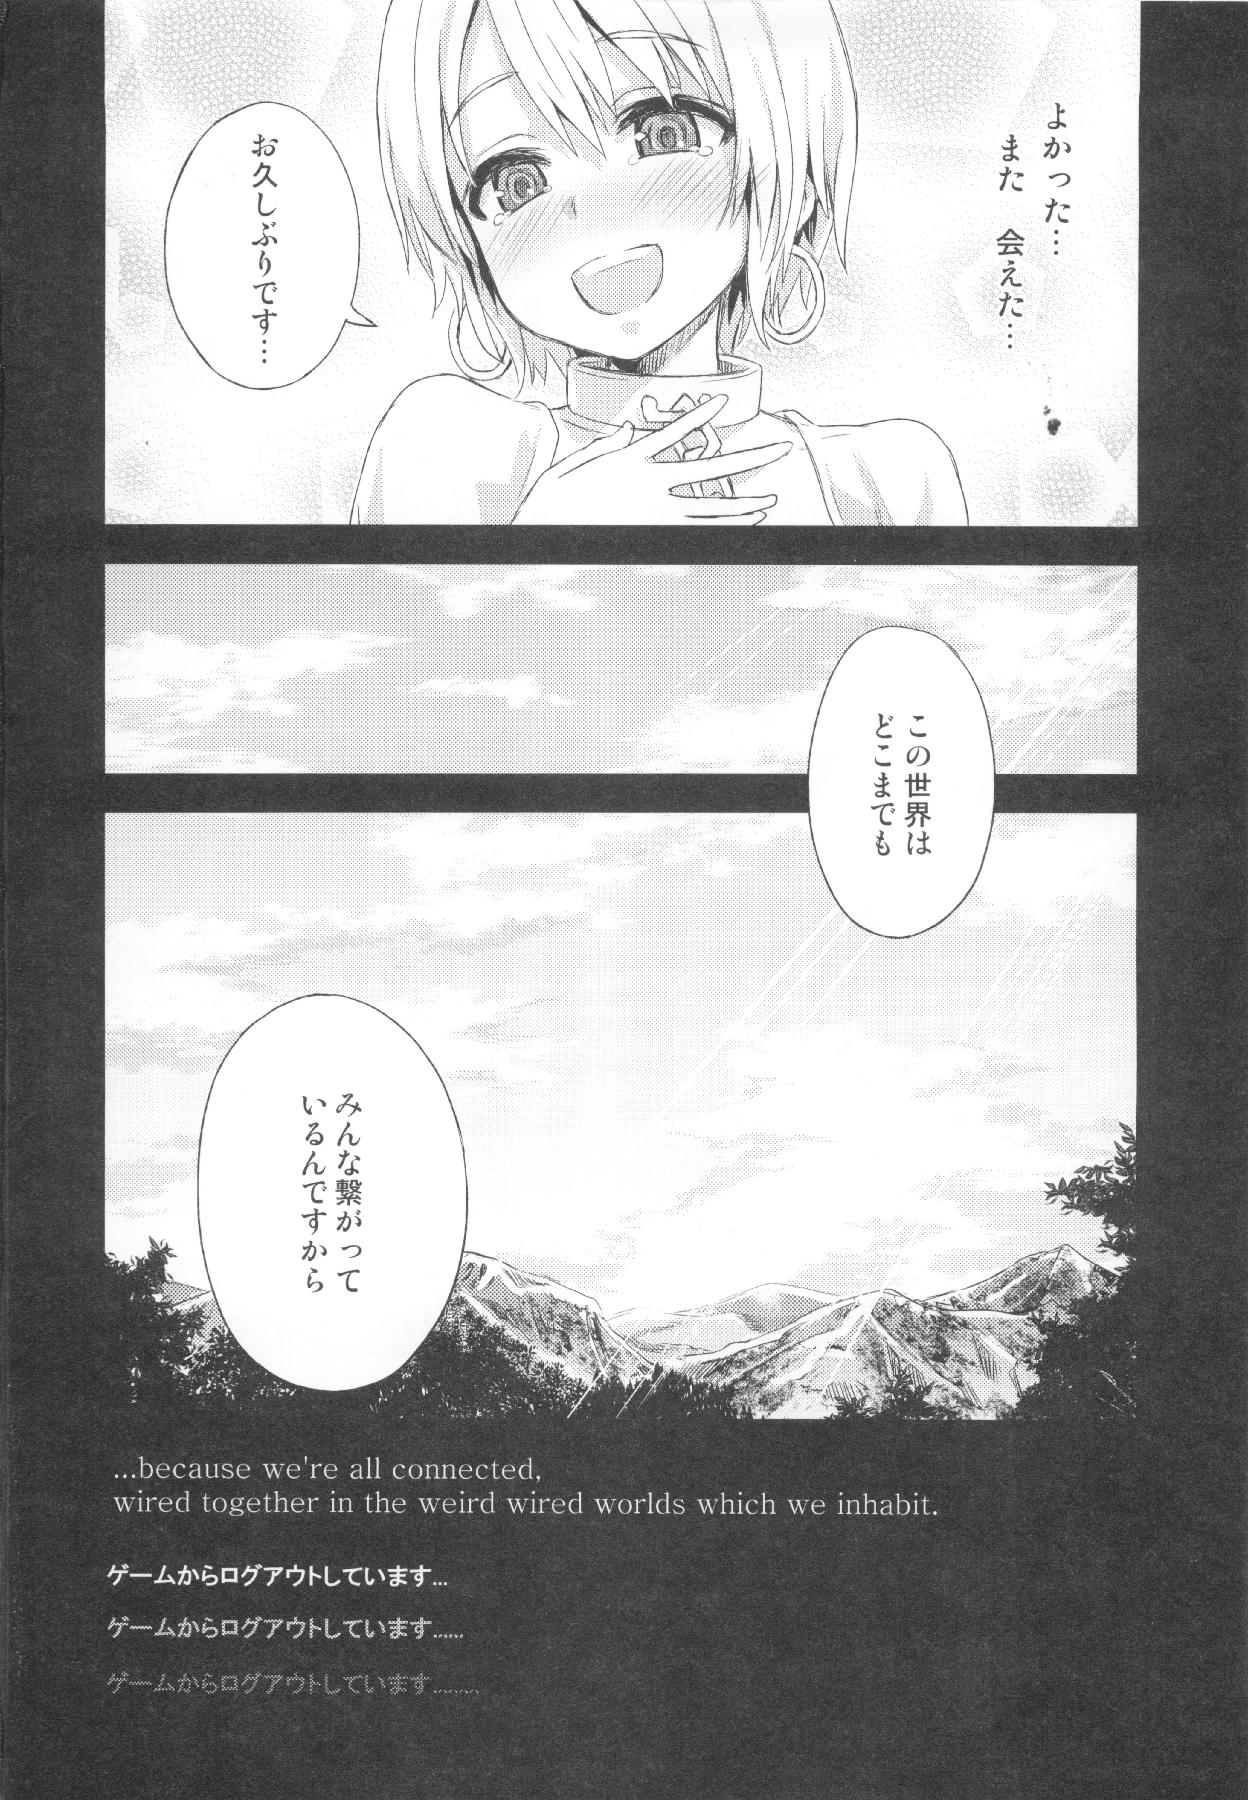 (C83) [Fatalpulse (Asanagi)] VictimGirls Compiled Vol.1 -Victimgirls Soushuuhen 1- MMO Game Selection (Various) 198